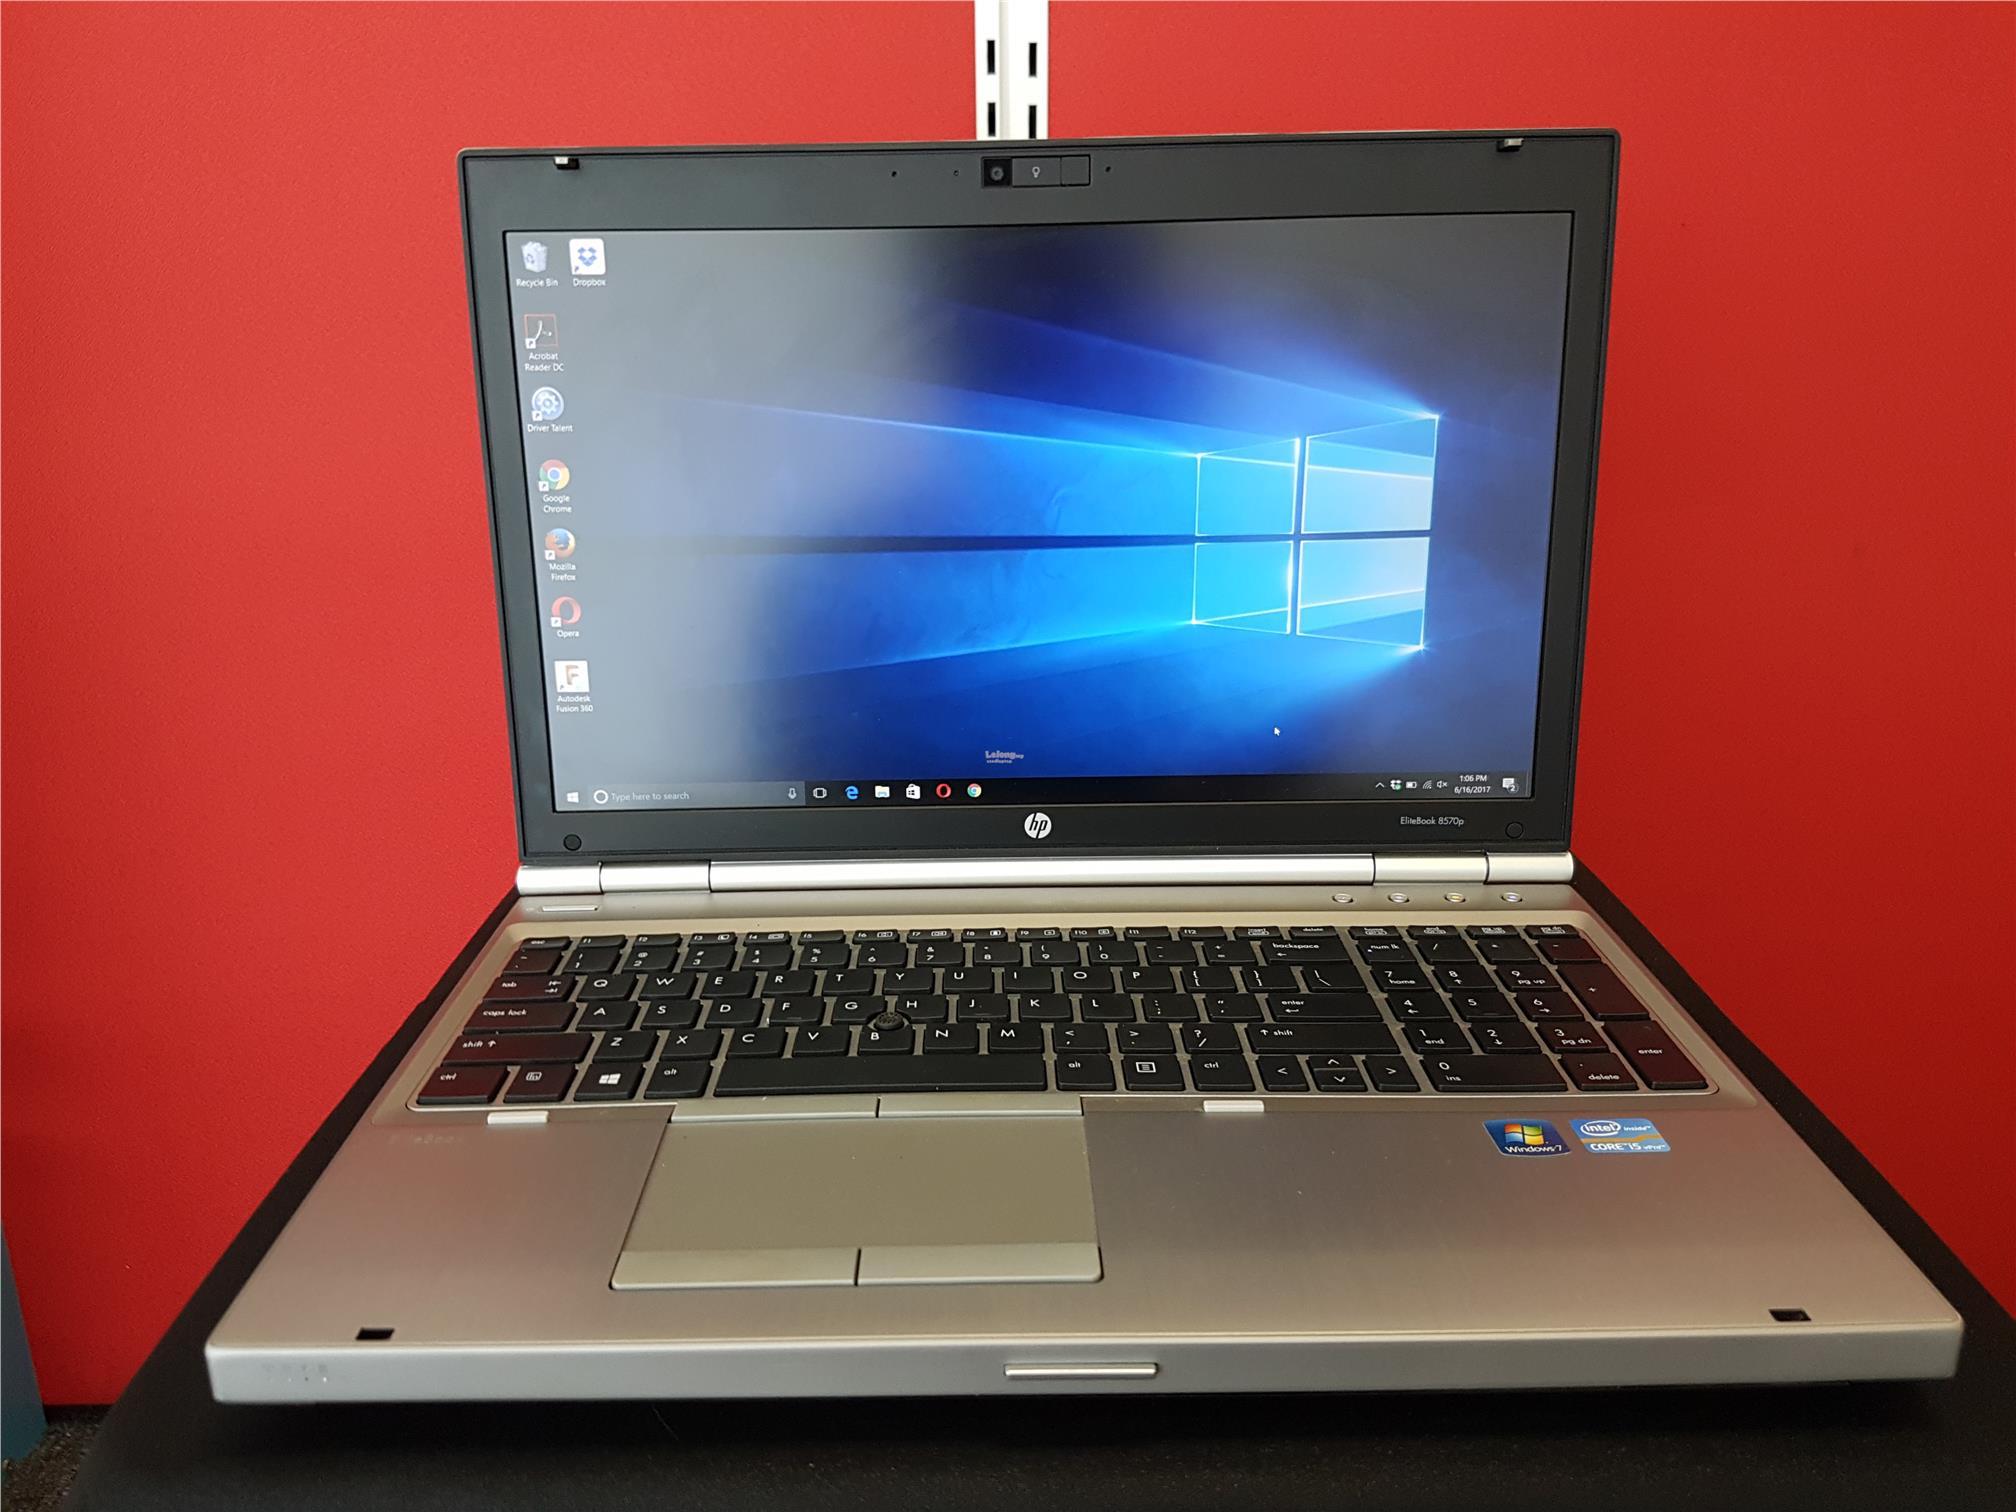 HP EliteBook 8570p Core i5 Laptop Notebook